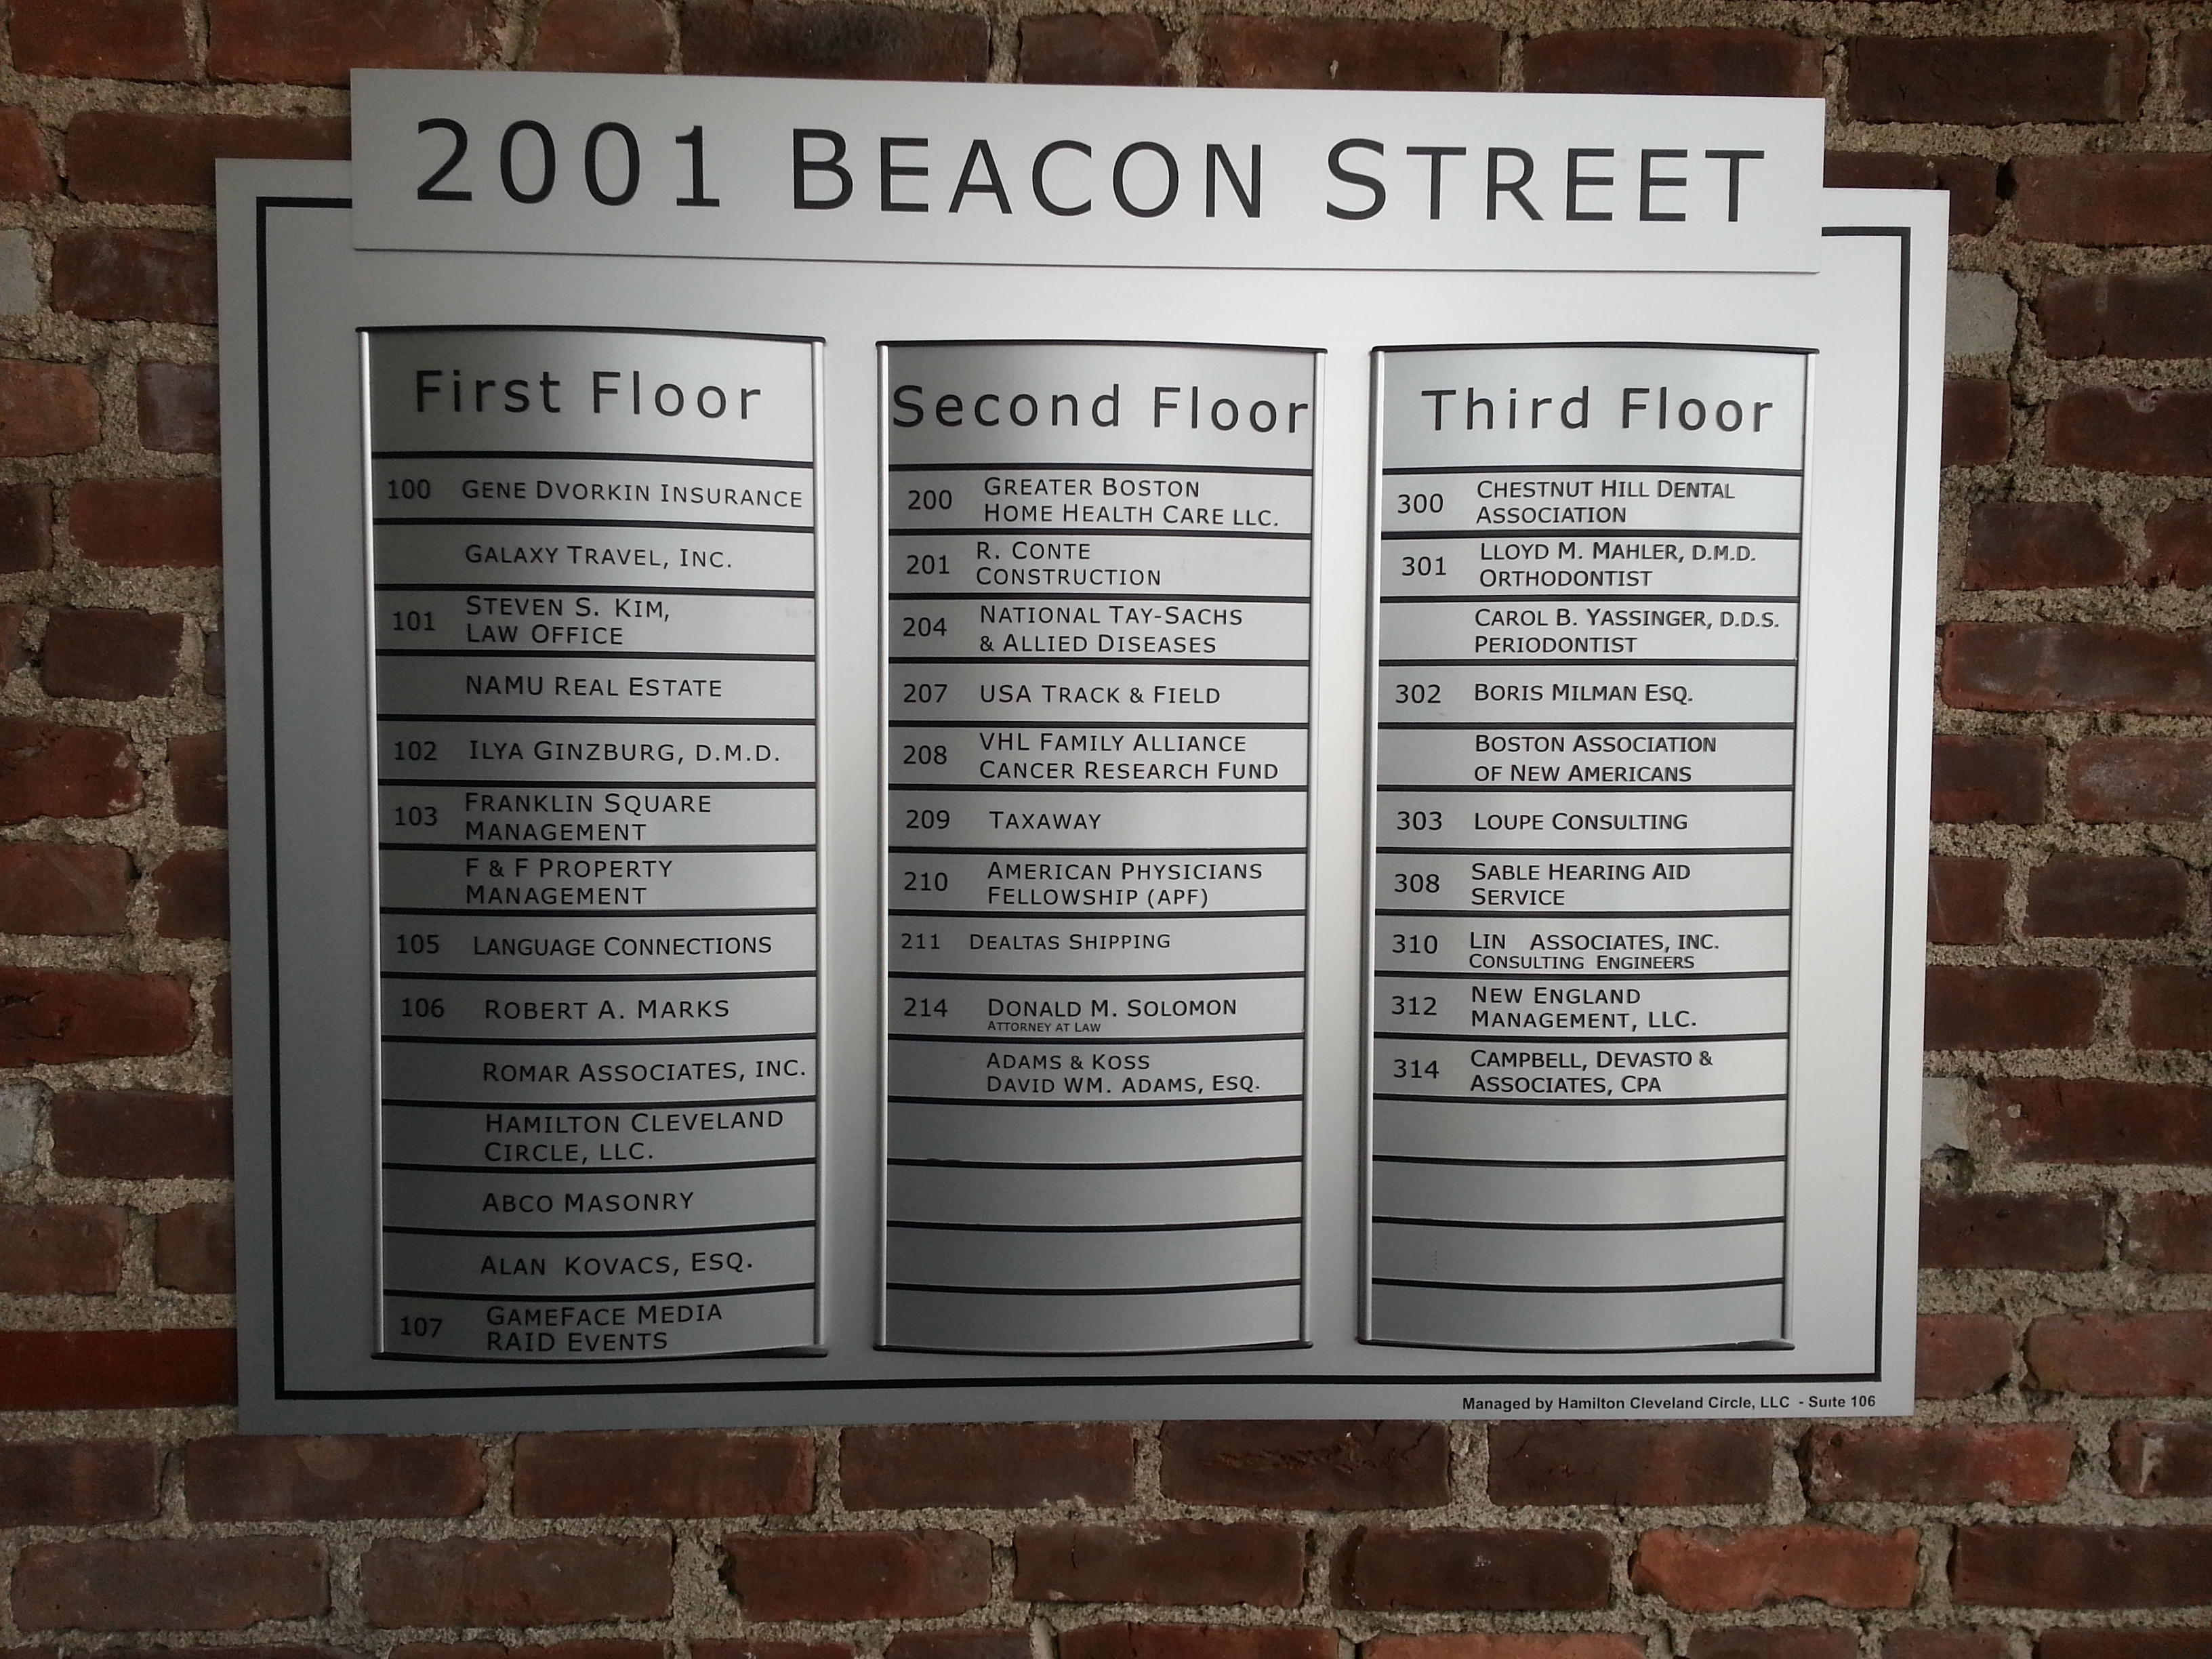 2001 Beacon Street